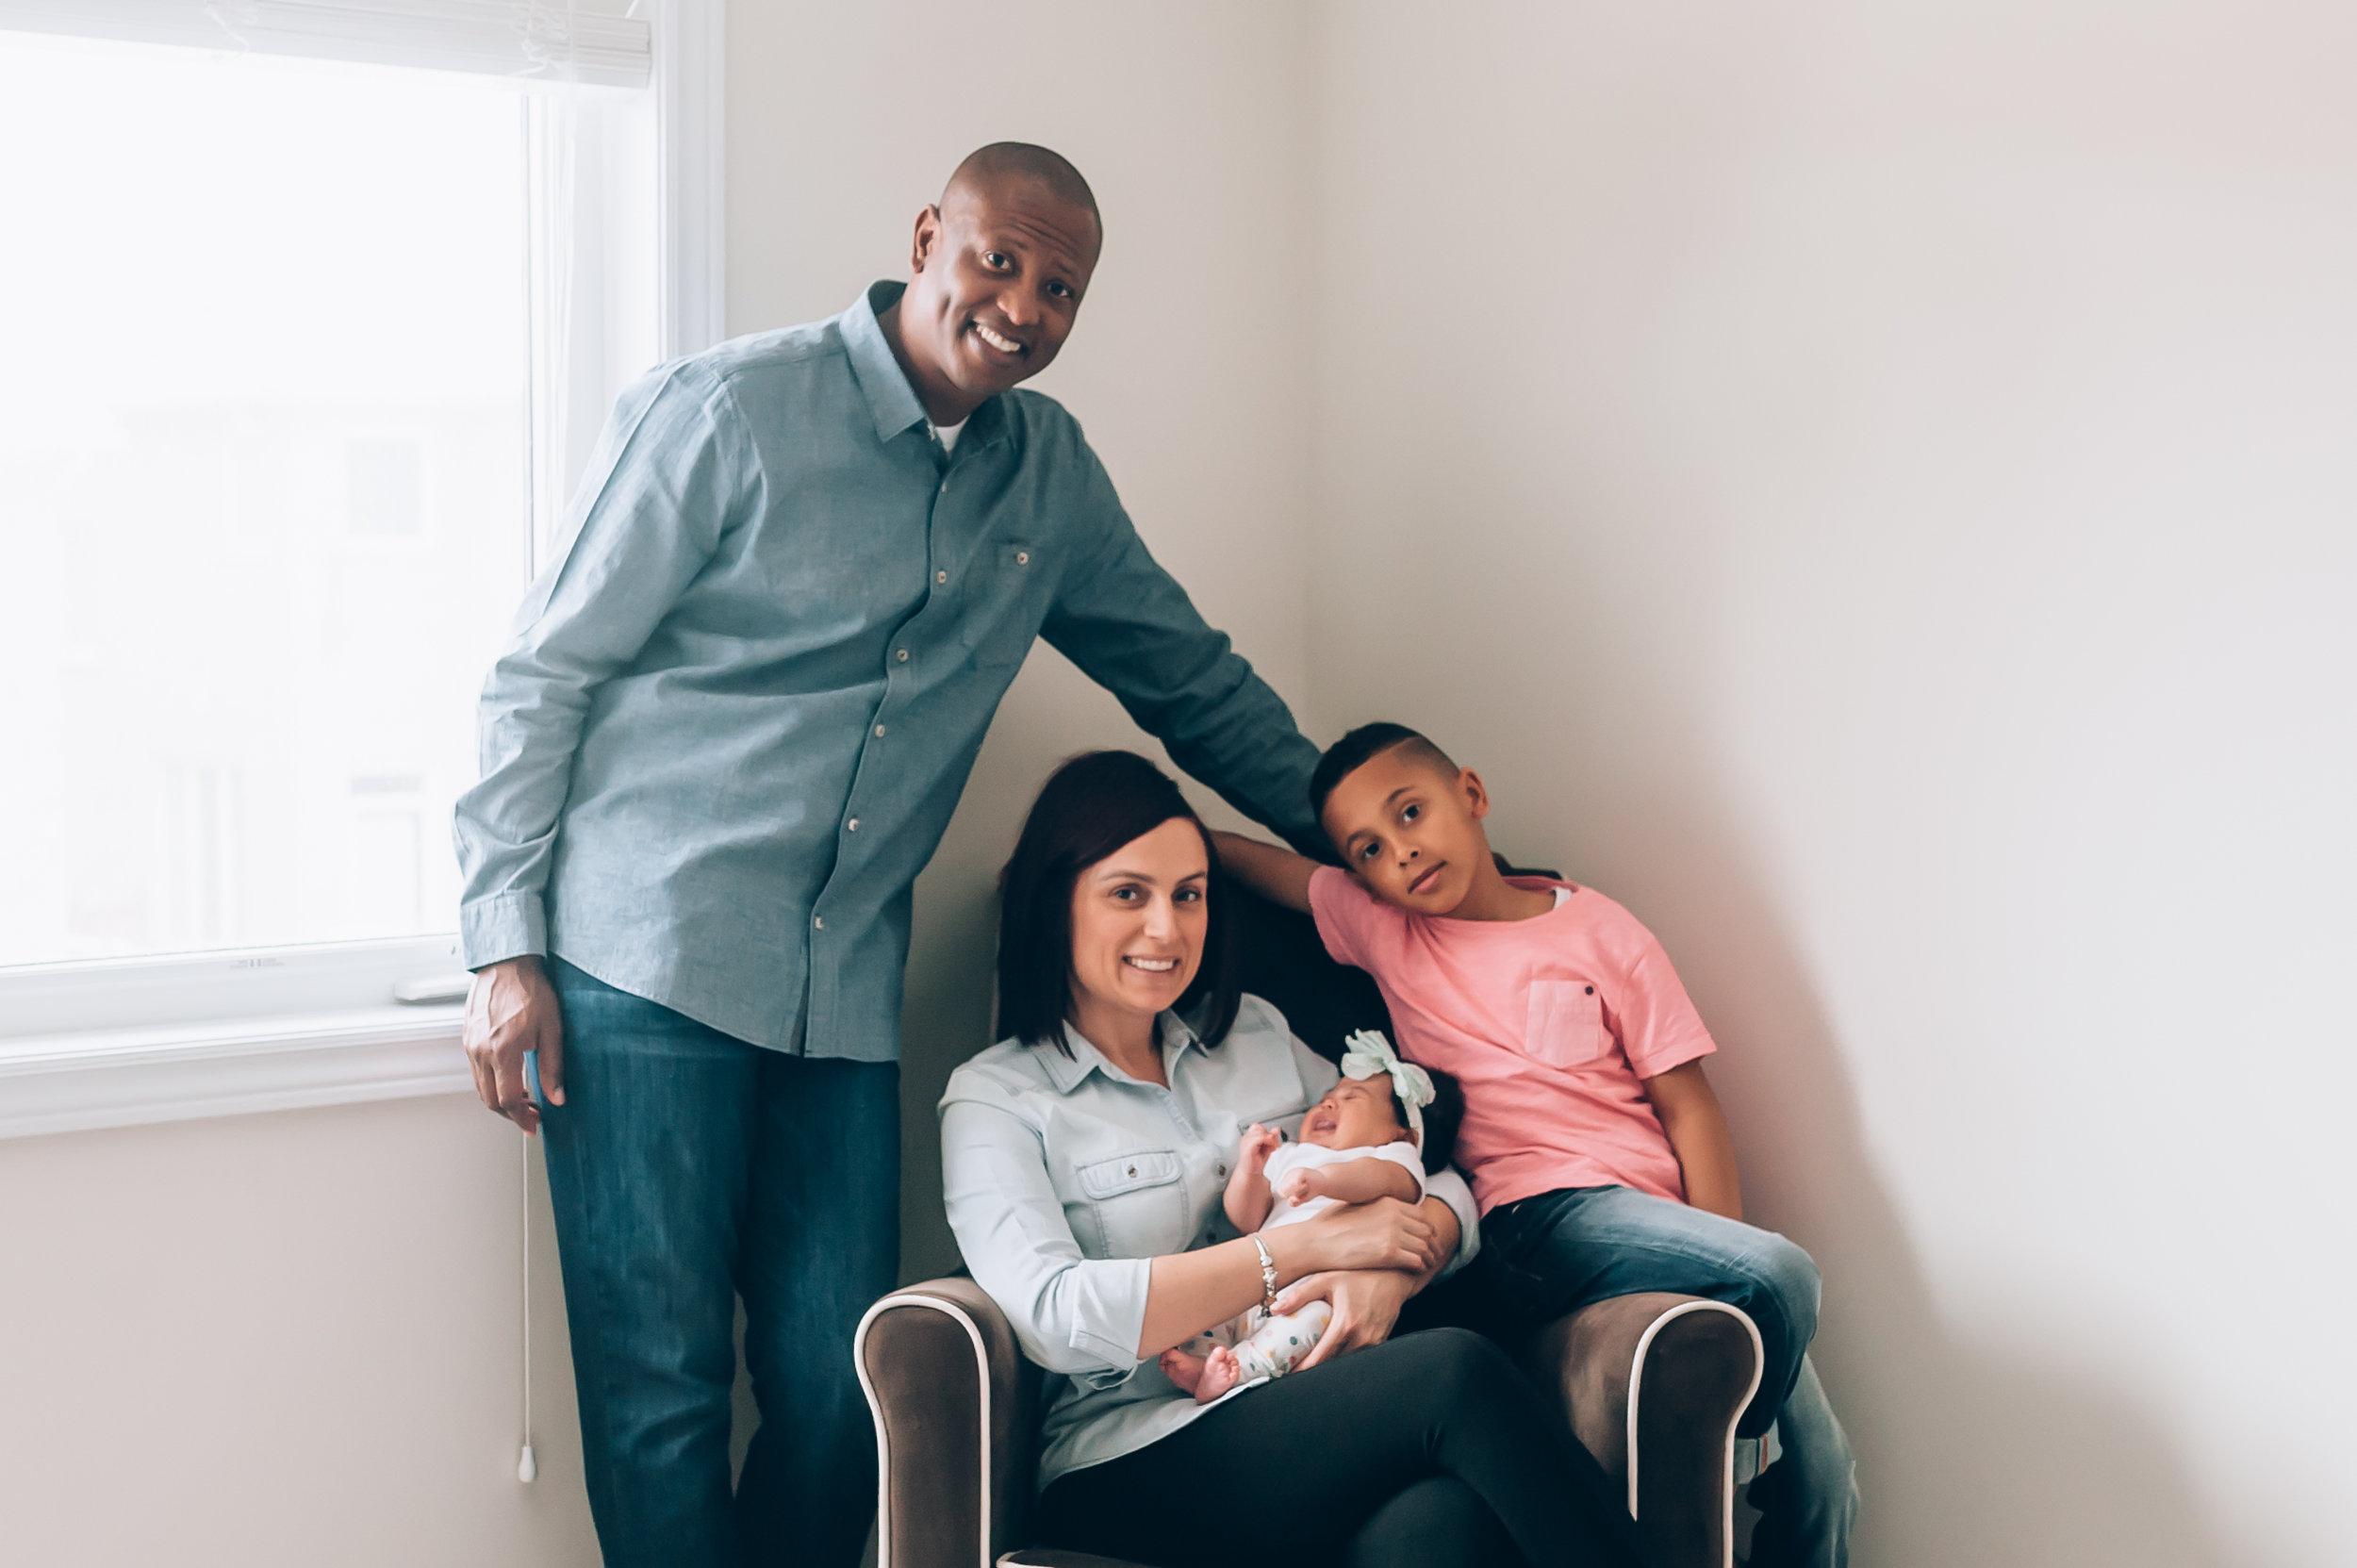 newborn, burlington newborn photographer, babies, newborn photography,lifestyle, lifestyle newborn photographer,family